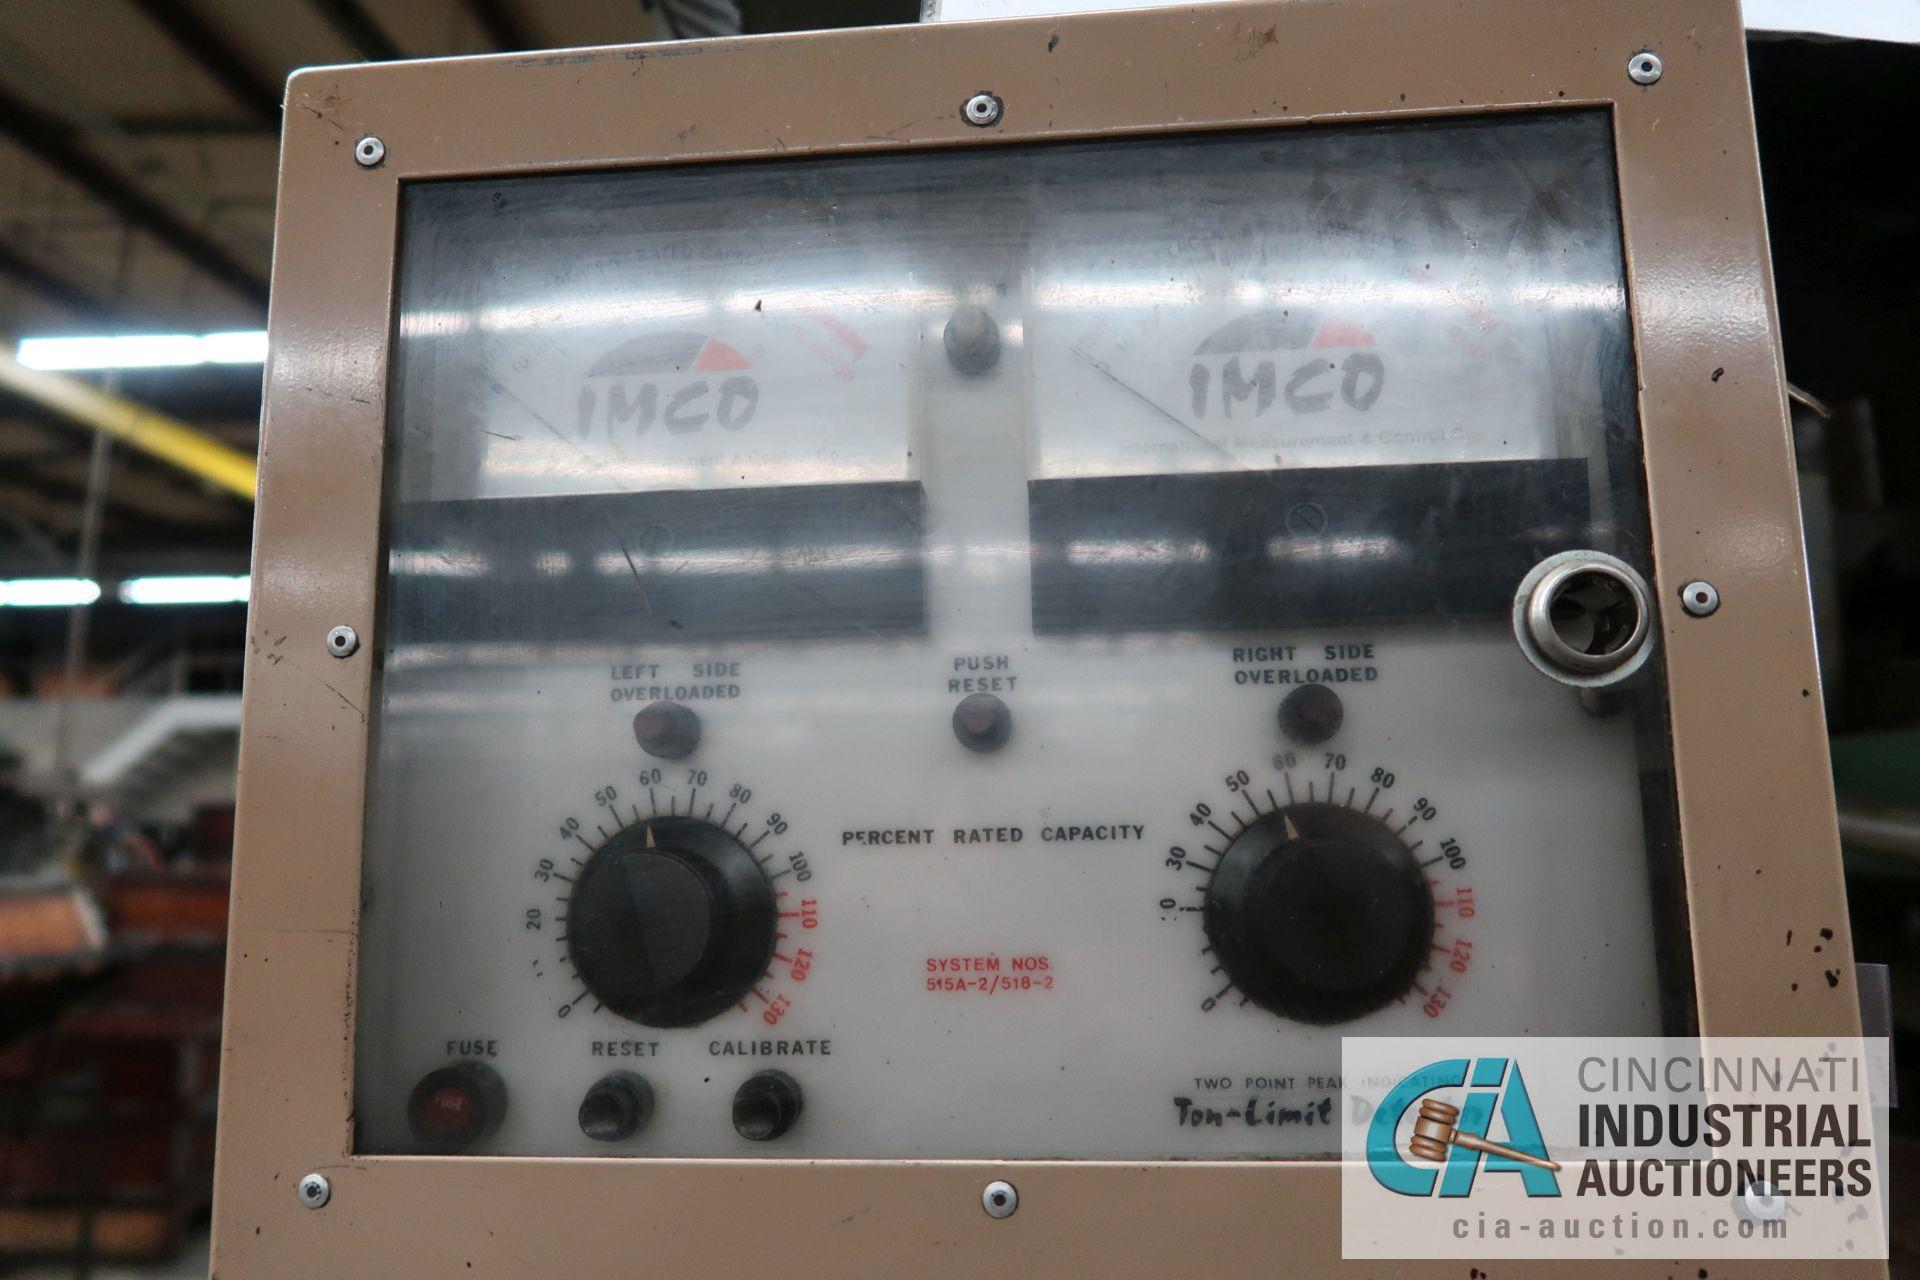 "100 TON CAPACITY L&J BACKED GEARED OBI PRESS; S/N 100242A, 5"" STROKE, 4"" ADJUST, 14-3/4"" SHUT HEIGHT - Image 8 of 13"